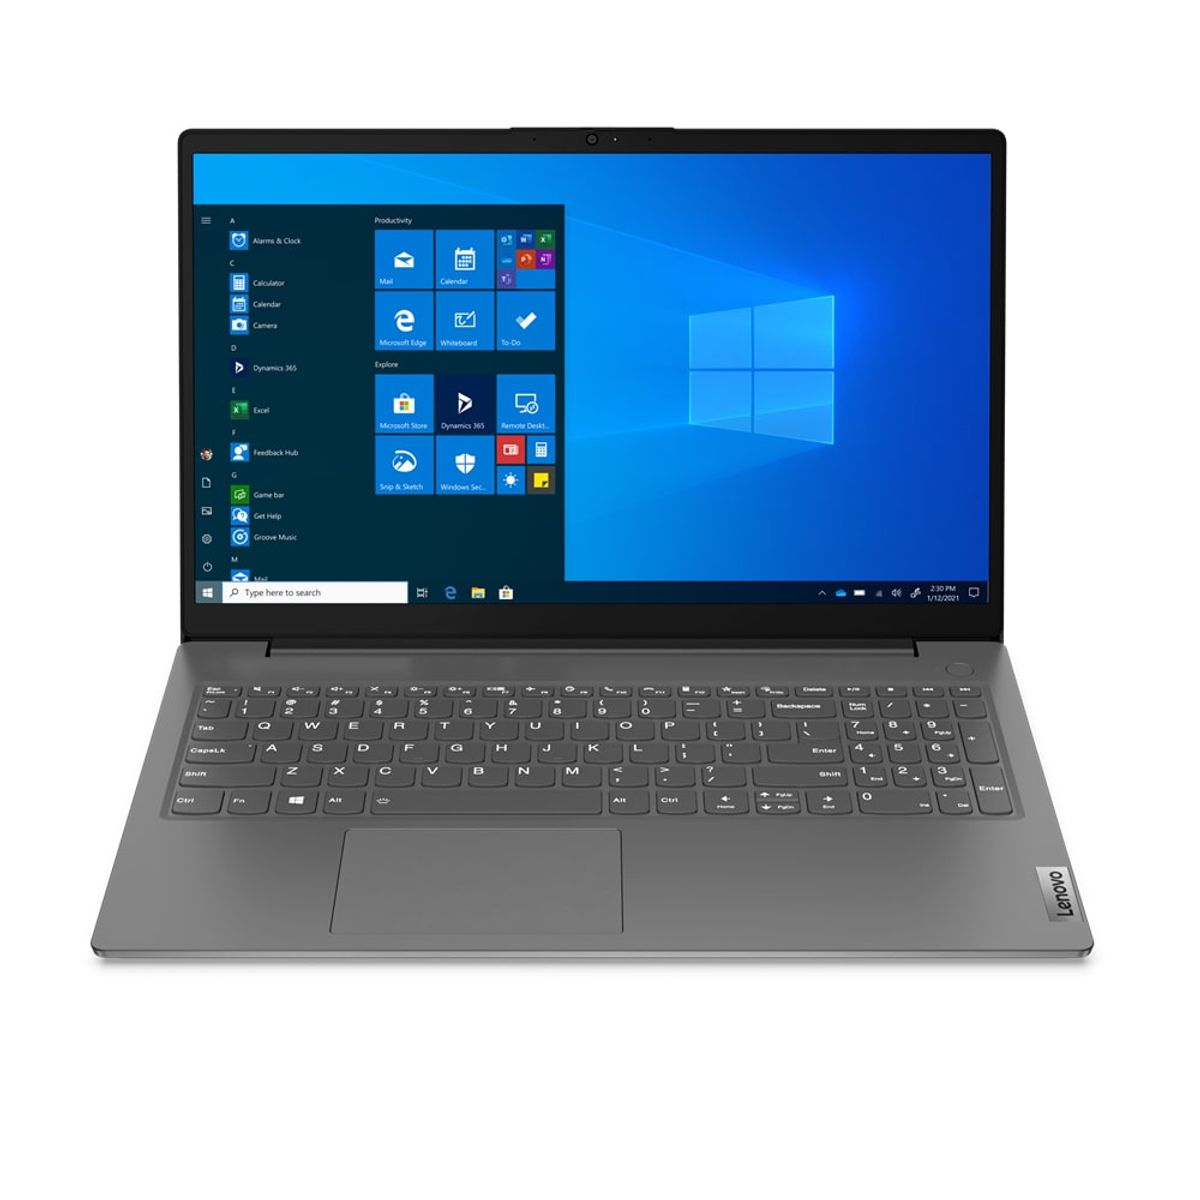 "Notebook - Lenovo 82nq0003br I3-10110u 2.10ghz 4gb 256gb Ssd Intel Hd Graphics Windows 10 Professional V15 15,6"" Polegadas"